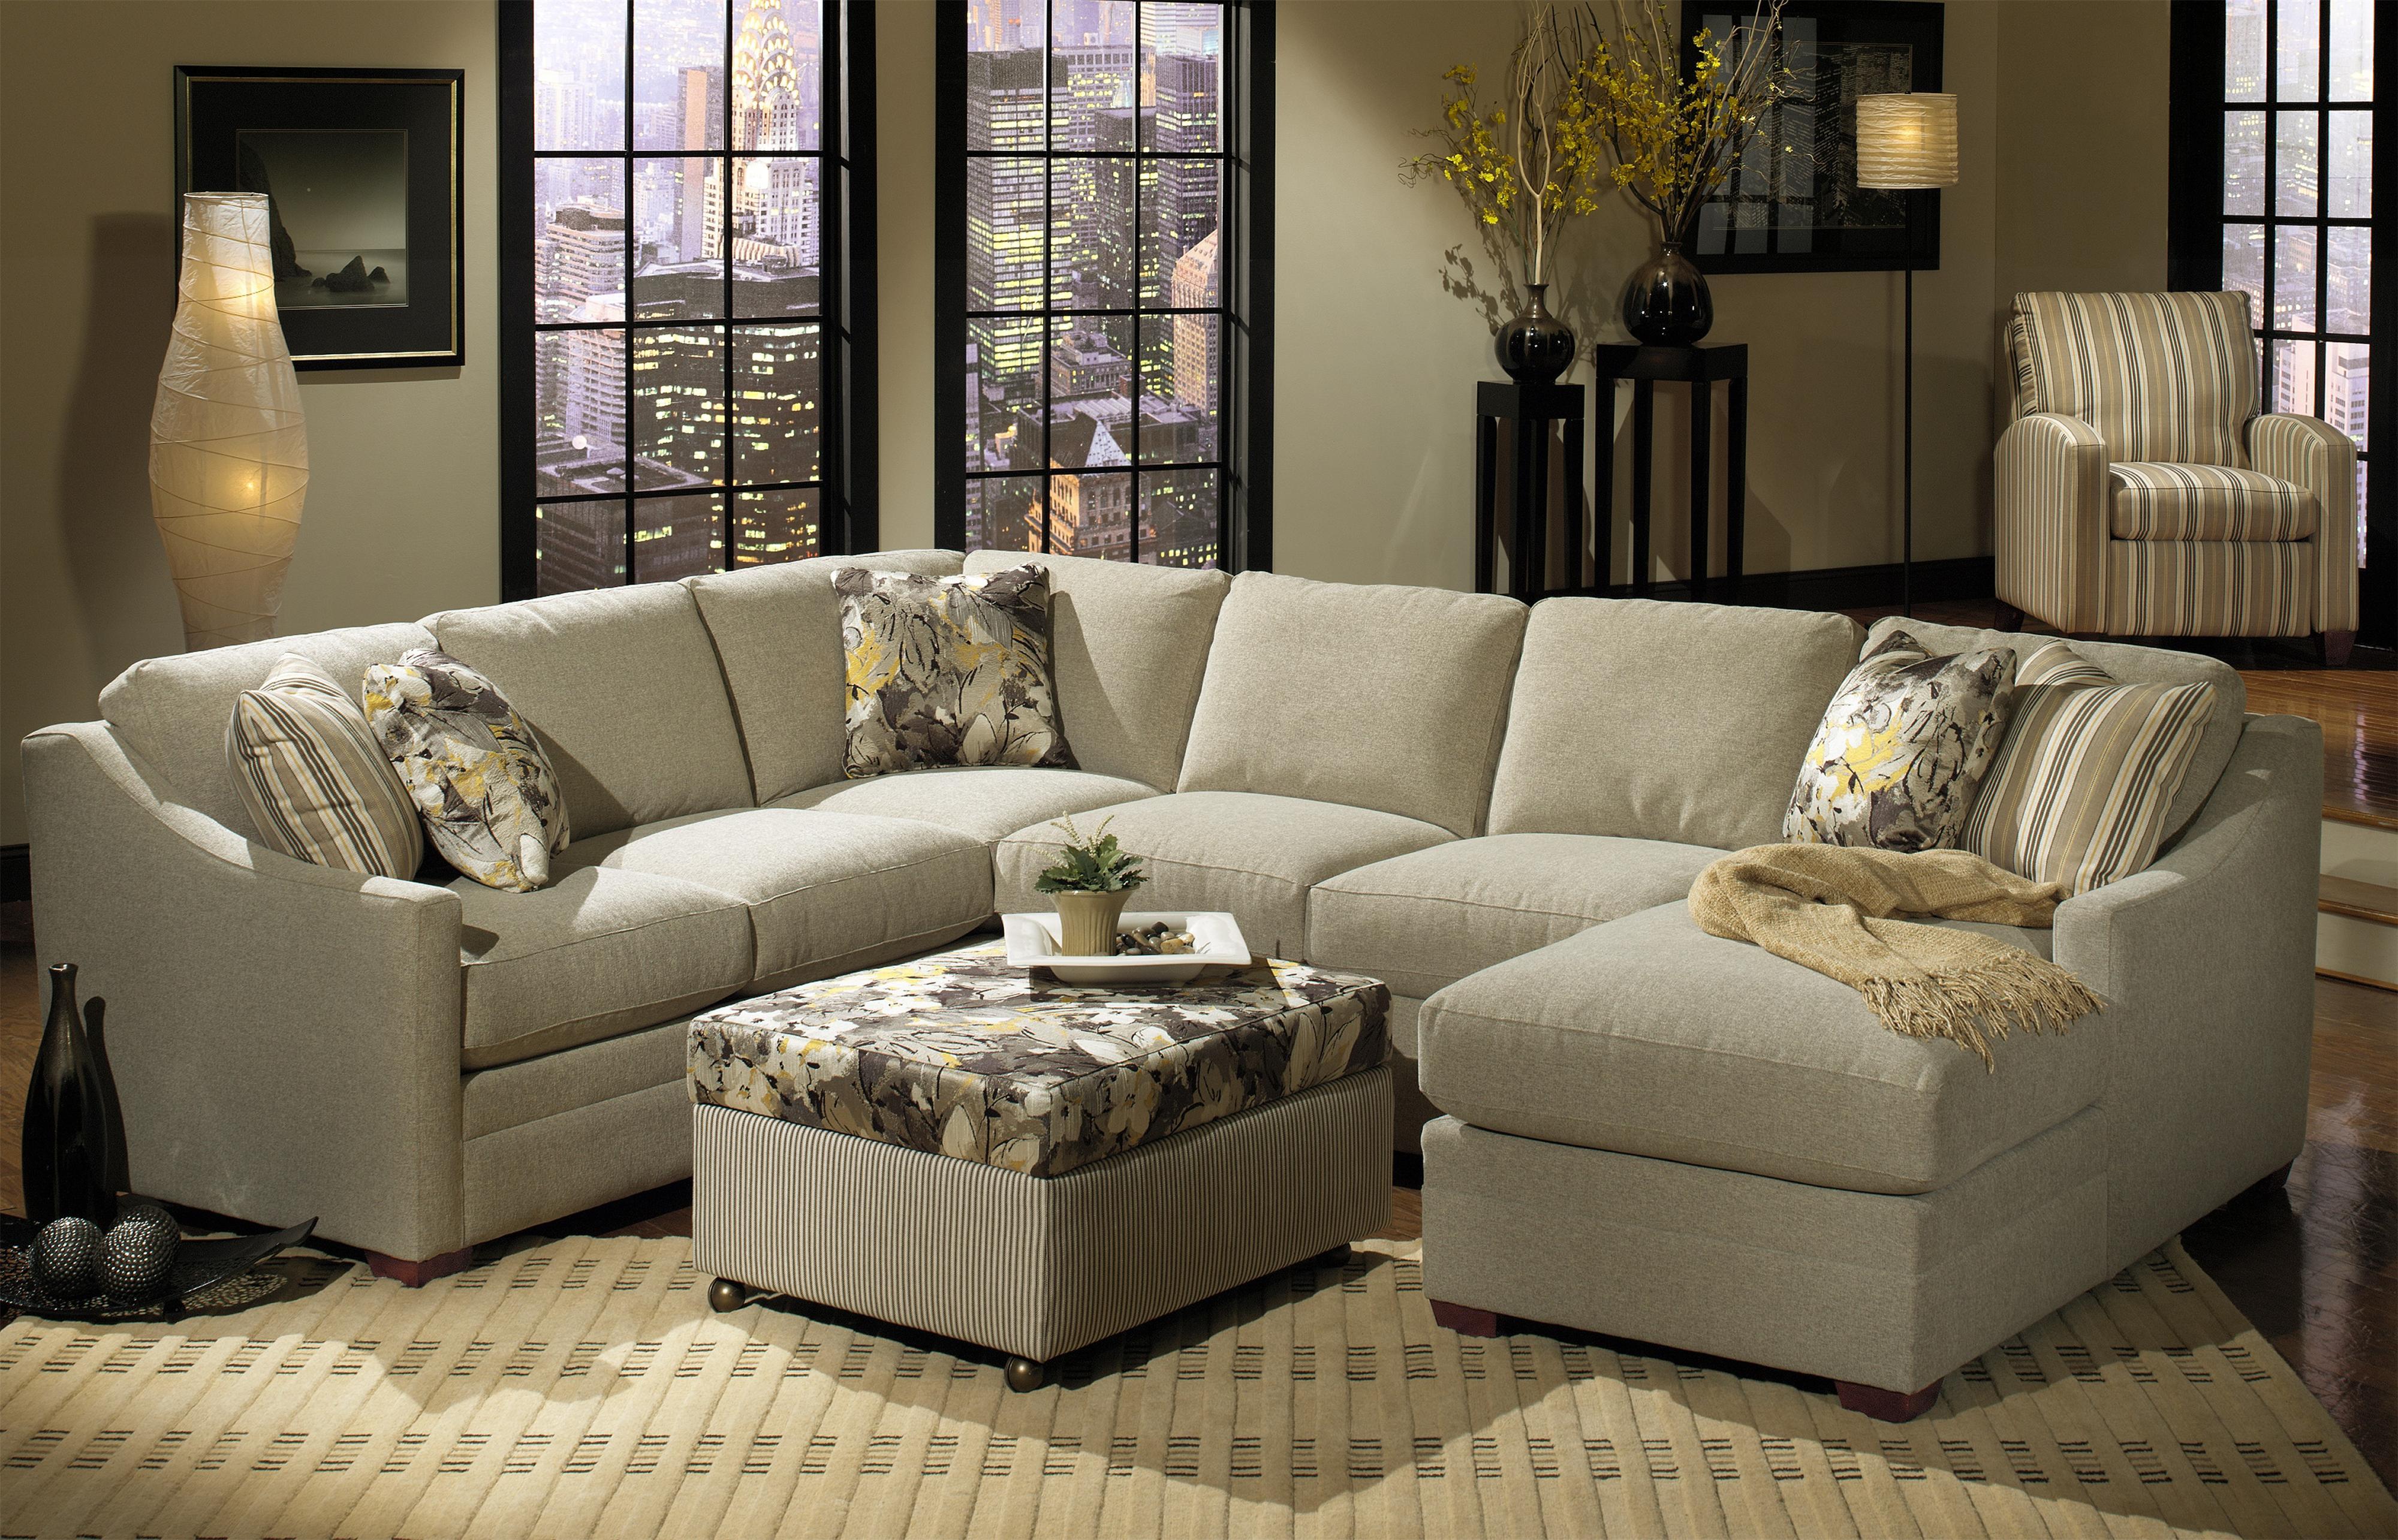 Jordan Furniture Premier Furniture Stores In Florence Sc 843 669 8513